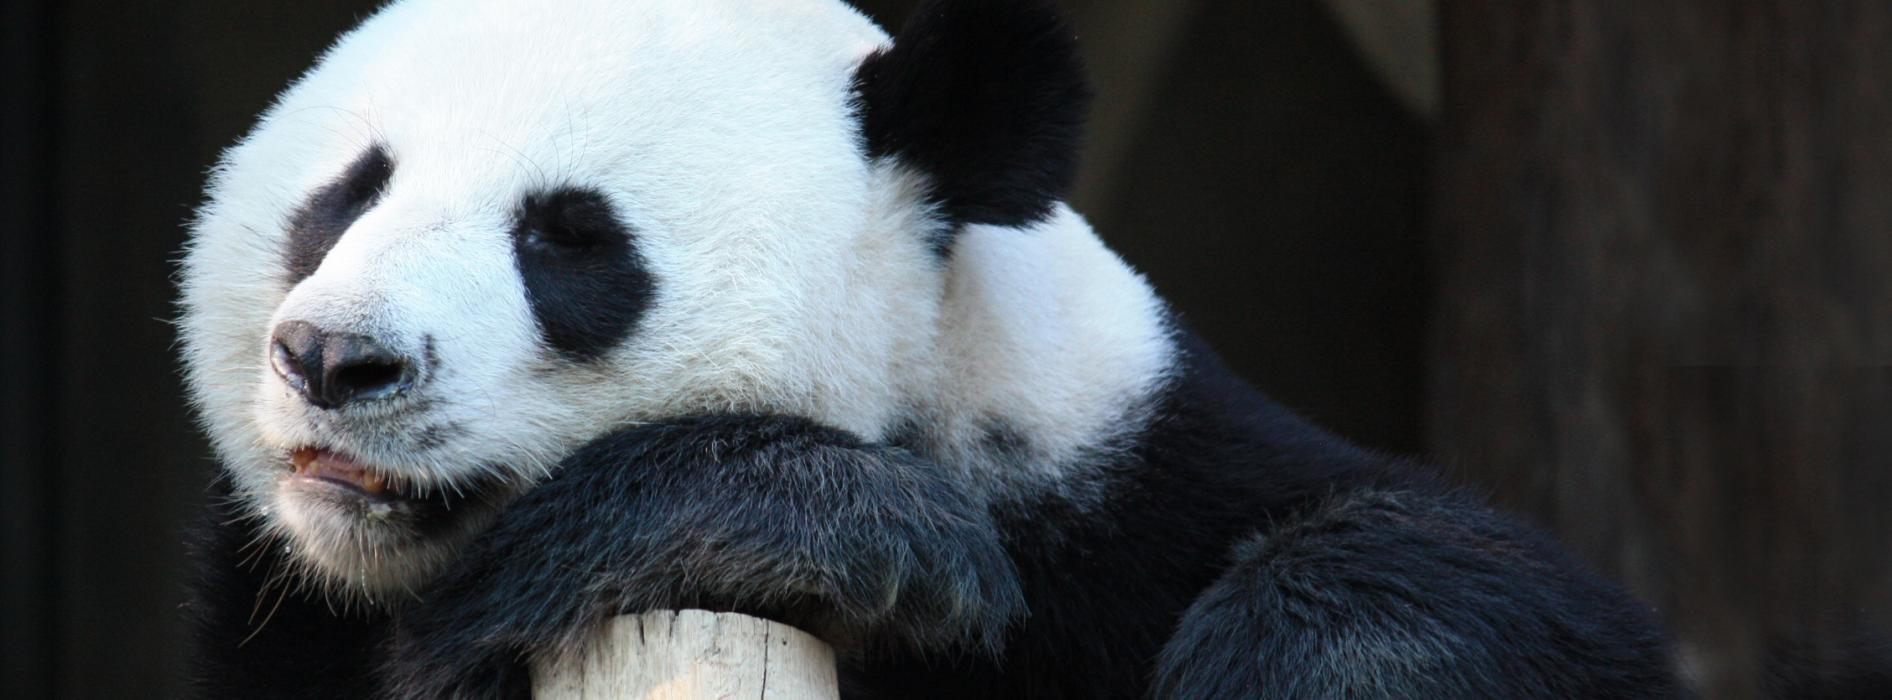 panda banner.jpg